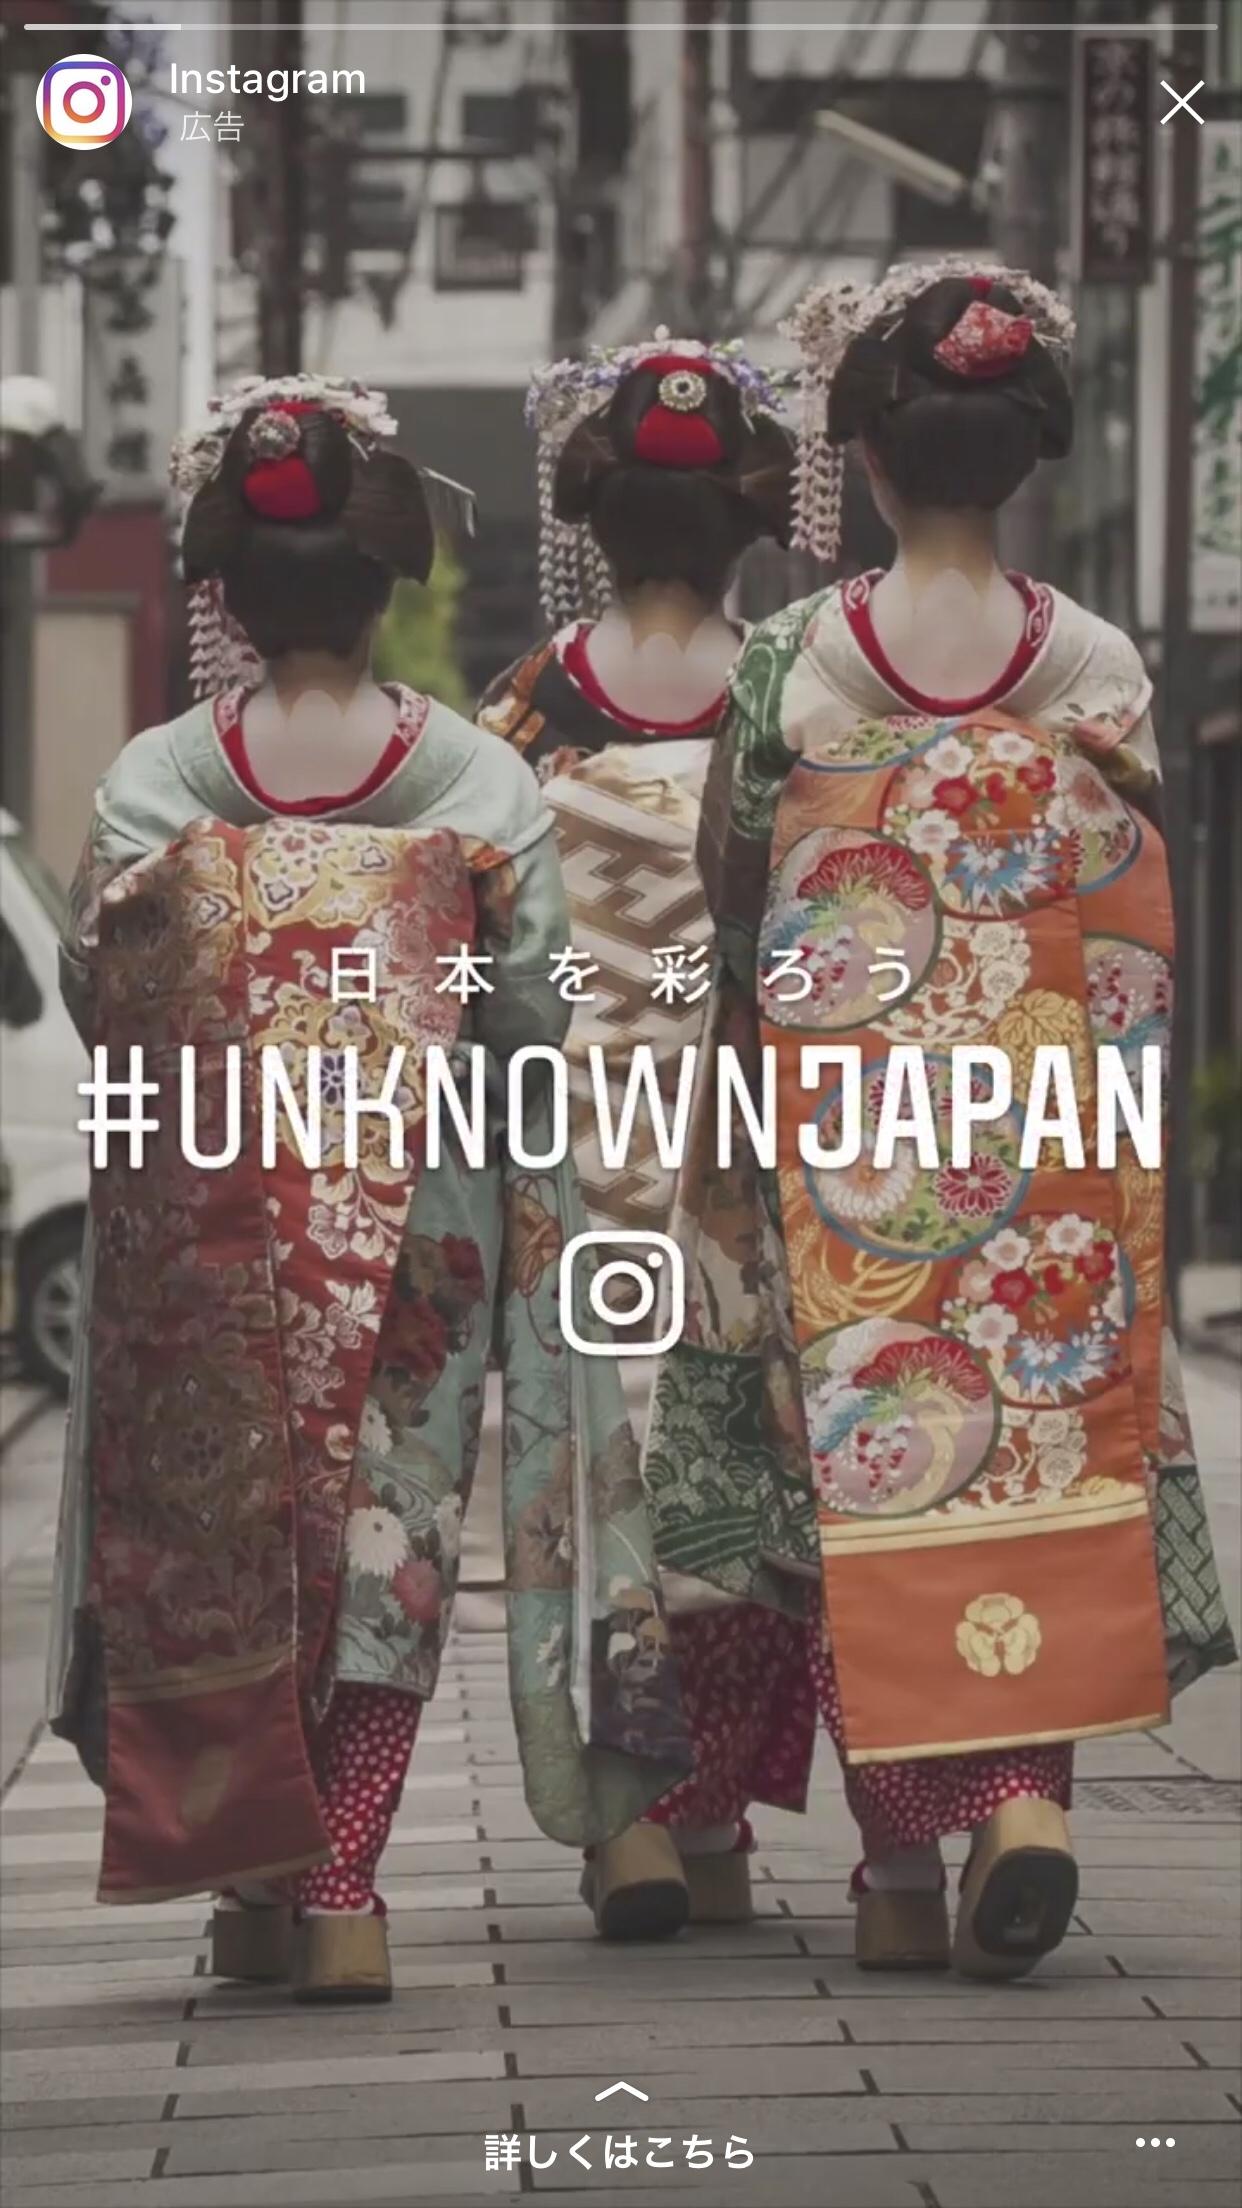 Instagramのストーリーズ